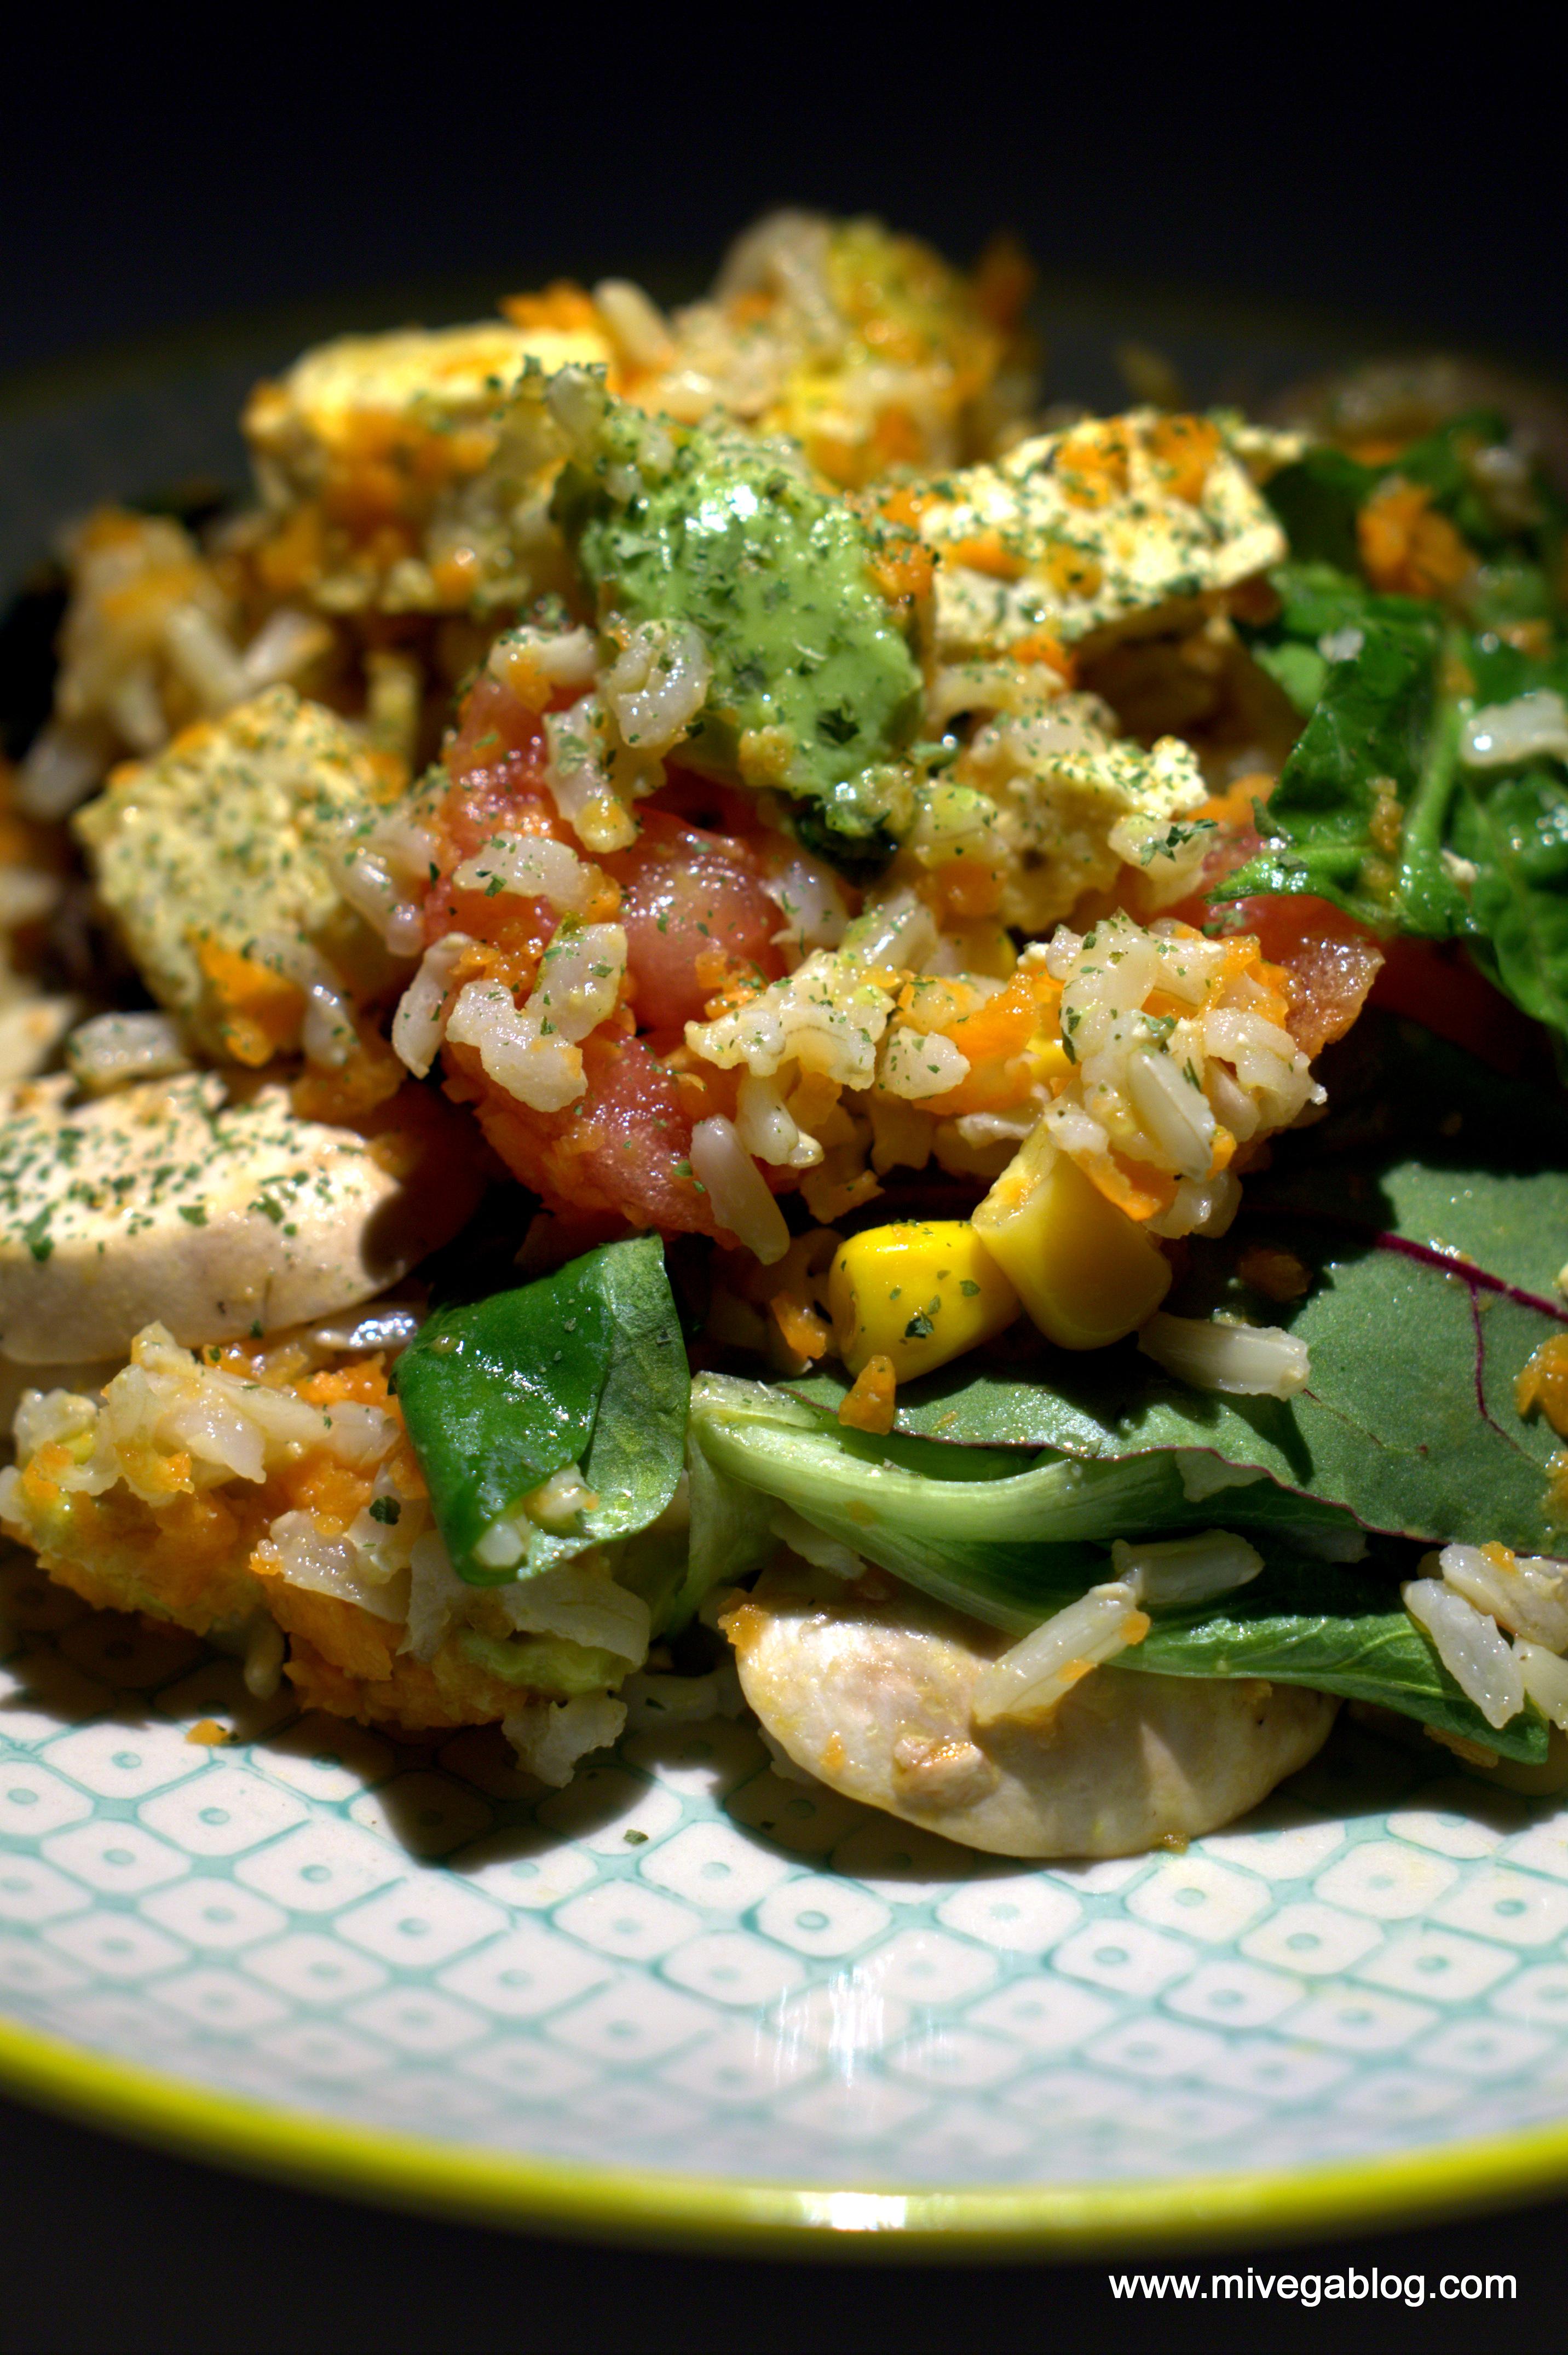 Ensalada de arroz basmati integral mivegablog - Ensalada de arroz light ...